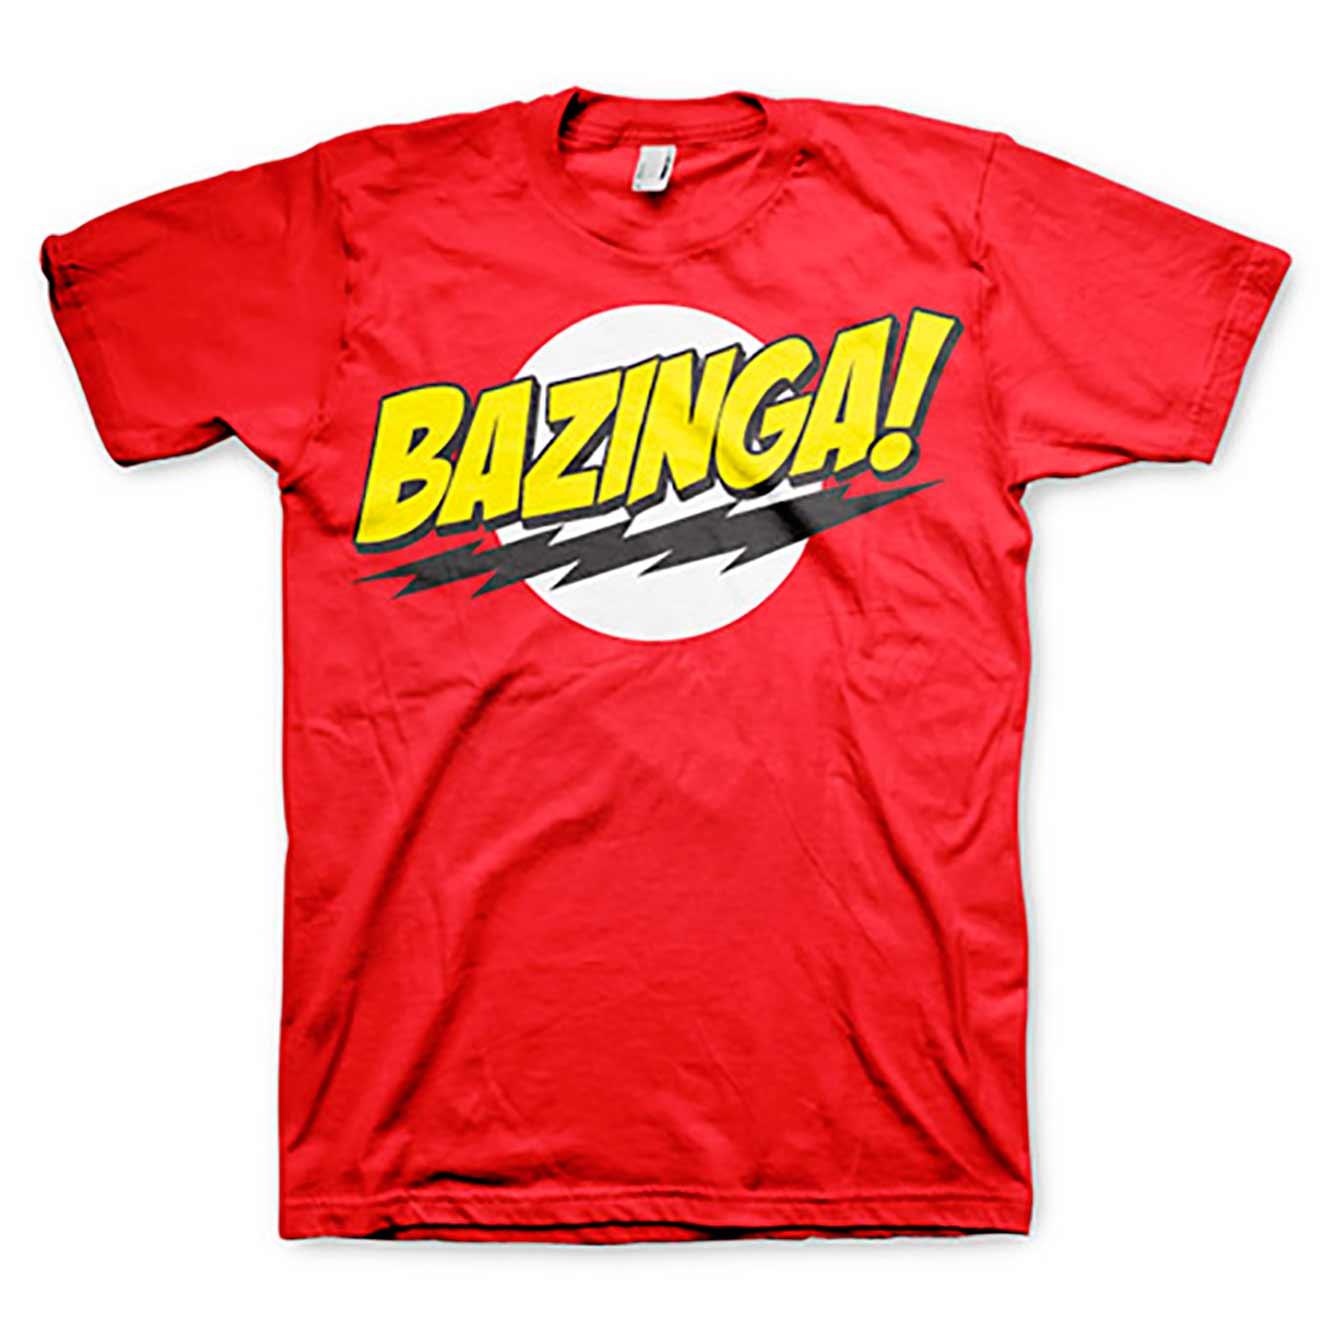 bazinga-t-shirt